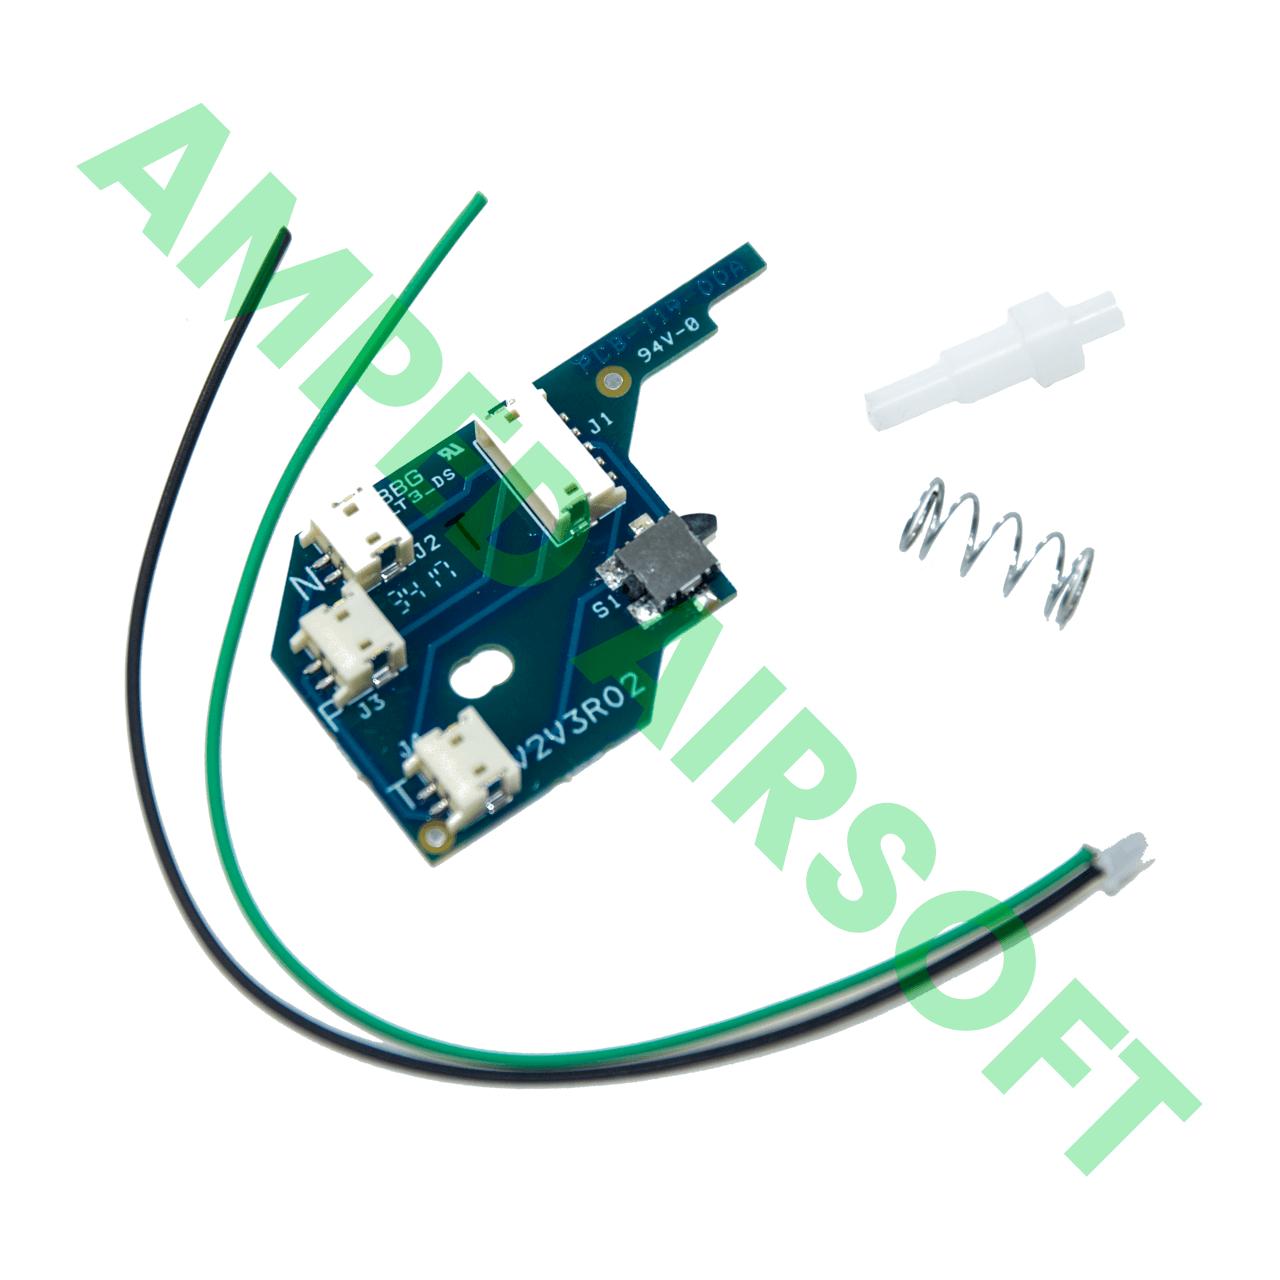 PolarStar - Jack/F1 Switch Board Kit for ARES V2/V3